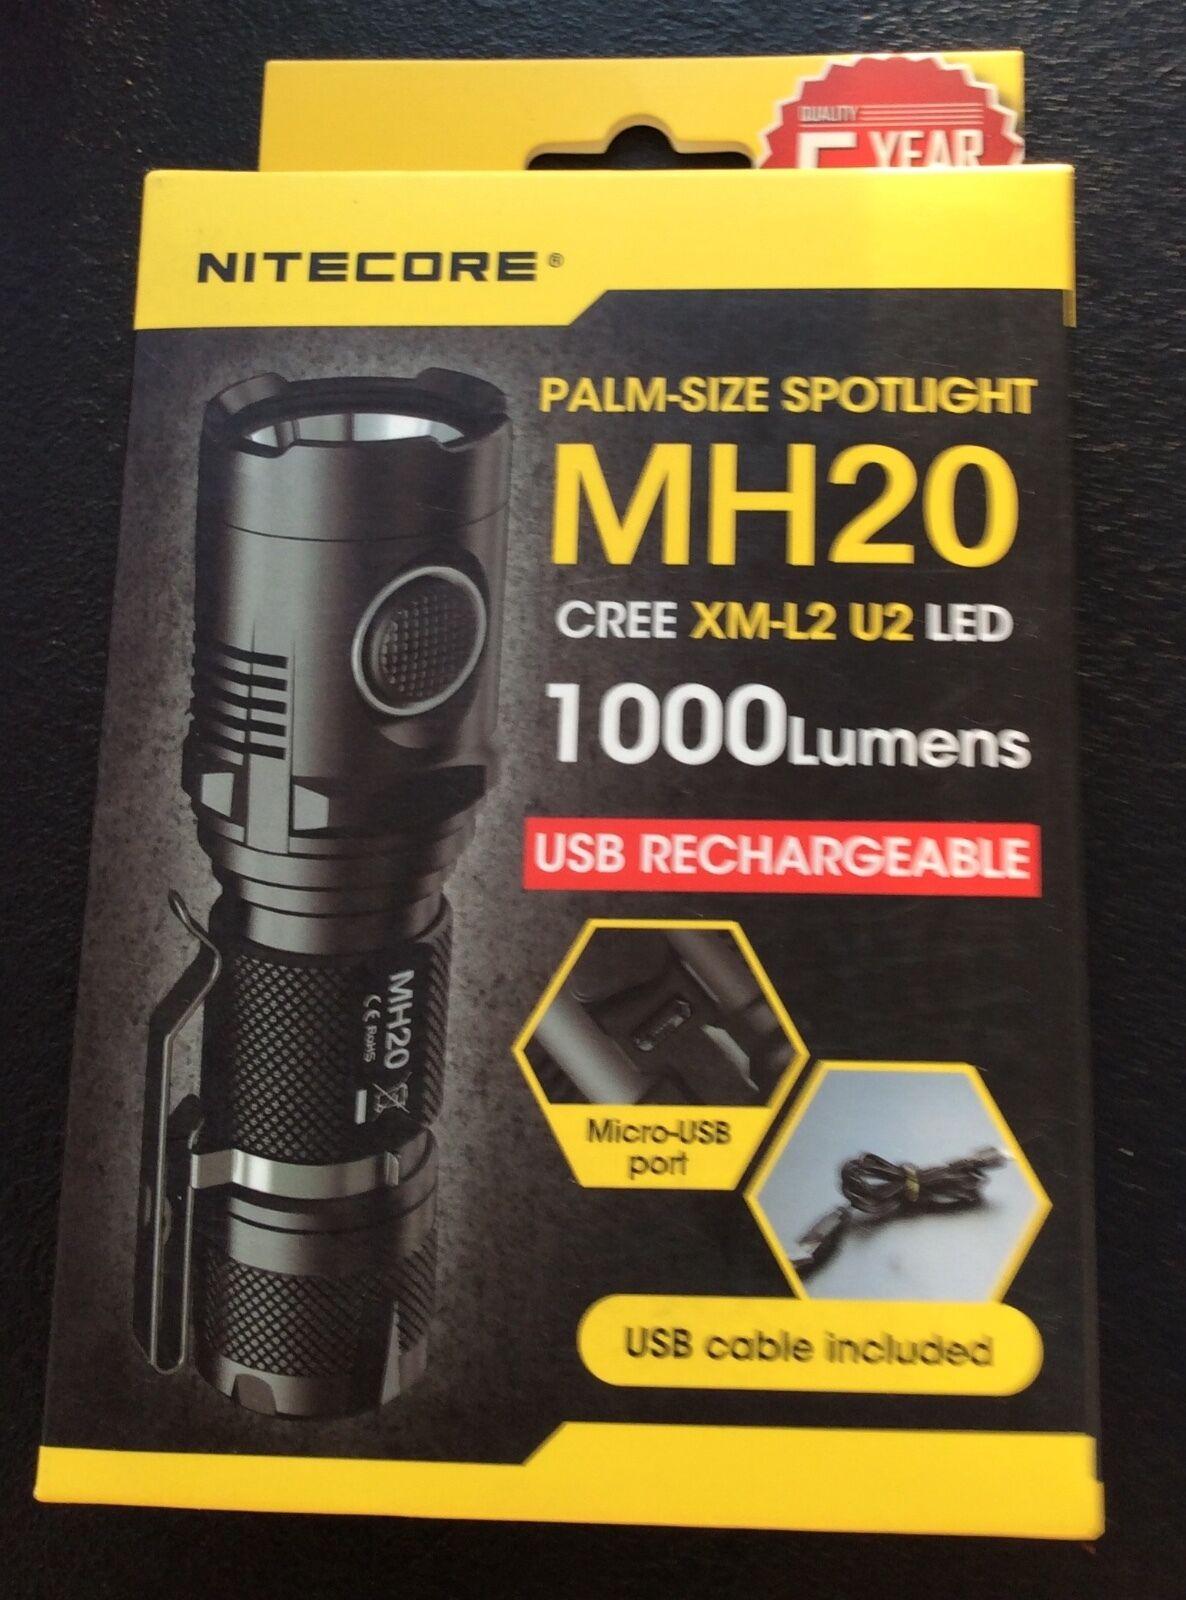 OVP Nightcore MH20 CREE palm-Größe spotlight wasserdicht XM-L2 LED 1000 Lumens